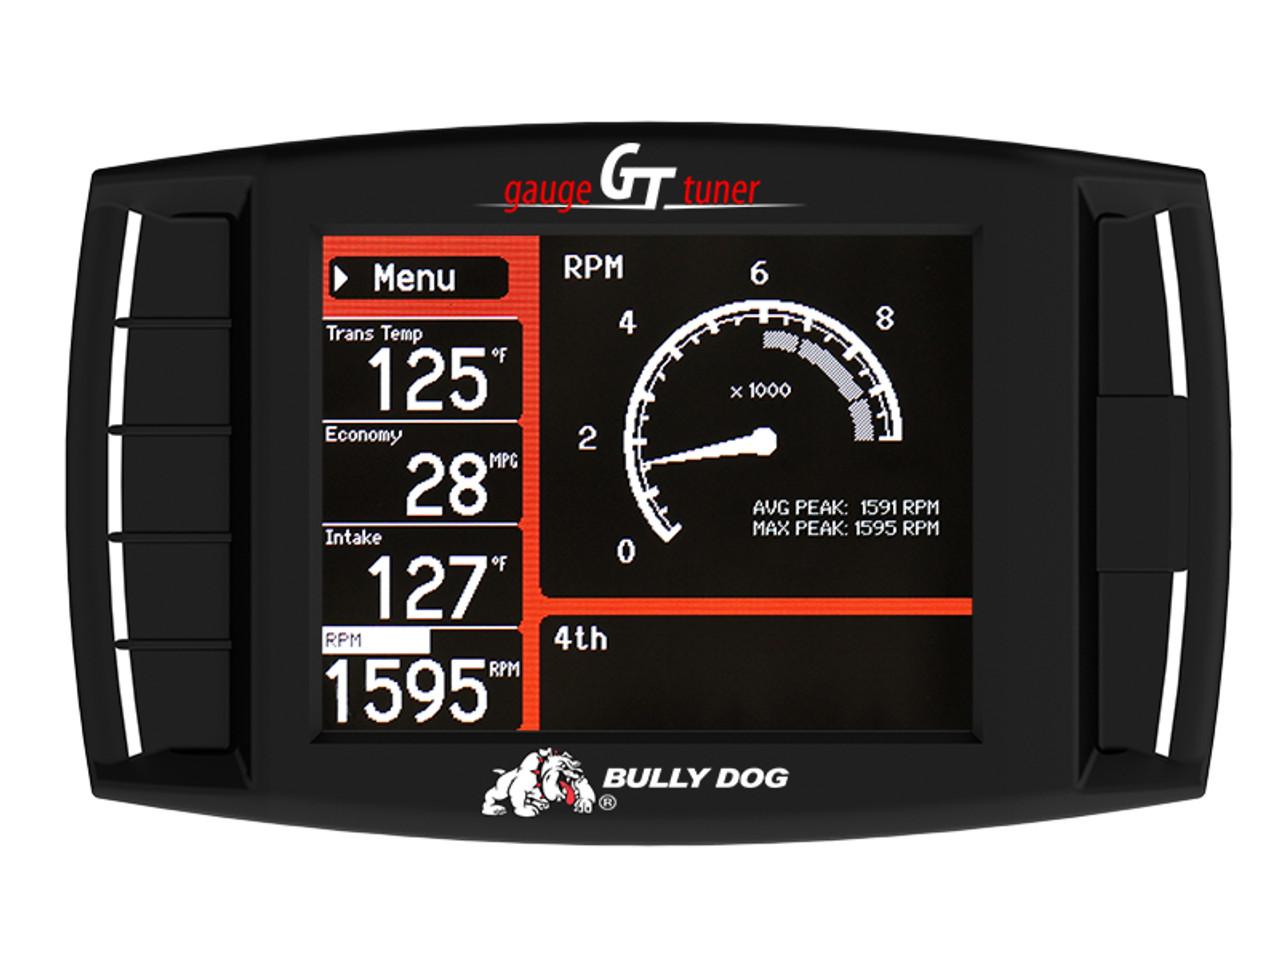 Bully Dog GT Plus Delete Tuner